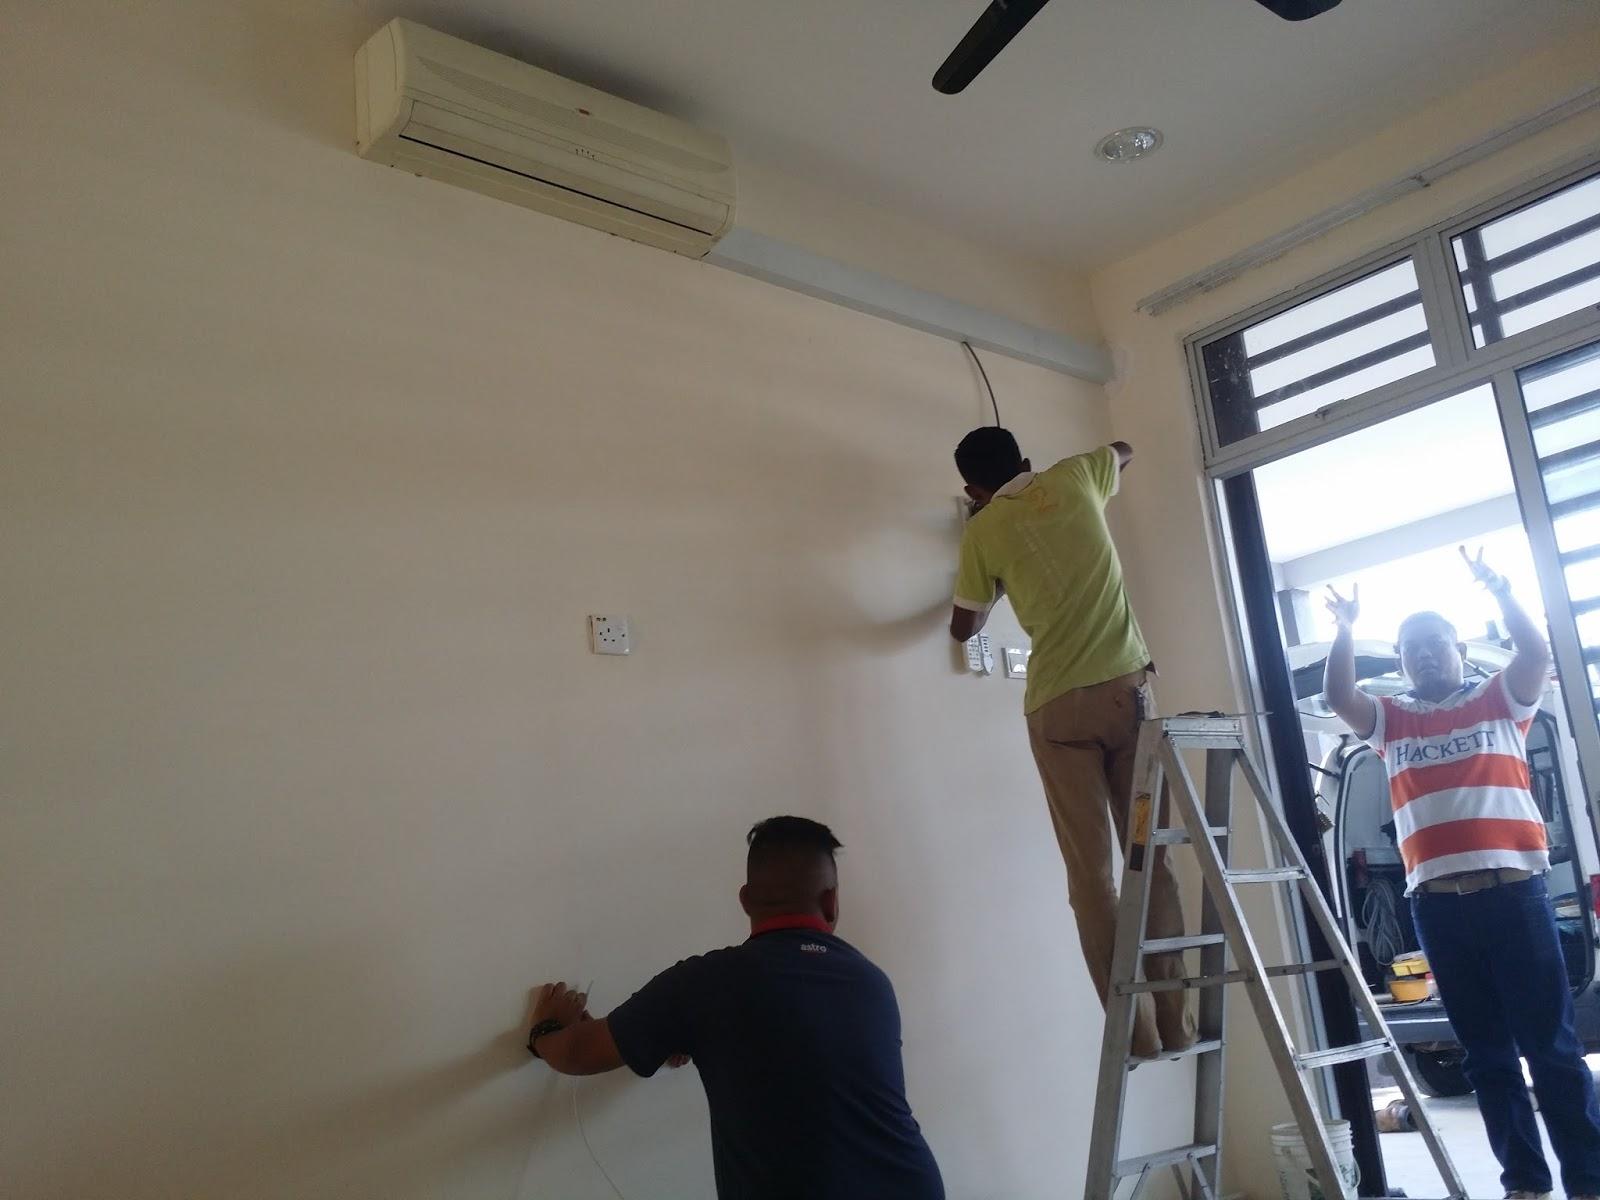 Kerja Pemasangan Aircond 1 5hp Di Ruang Tamu Homestay Fayyadhah 2 Kuantan Under Construction